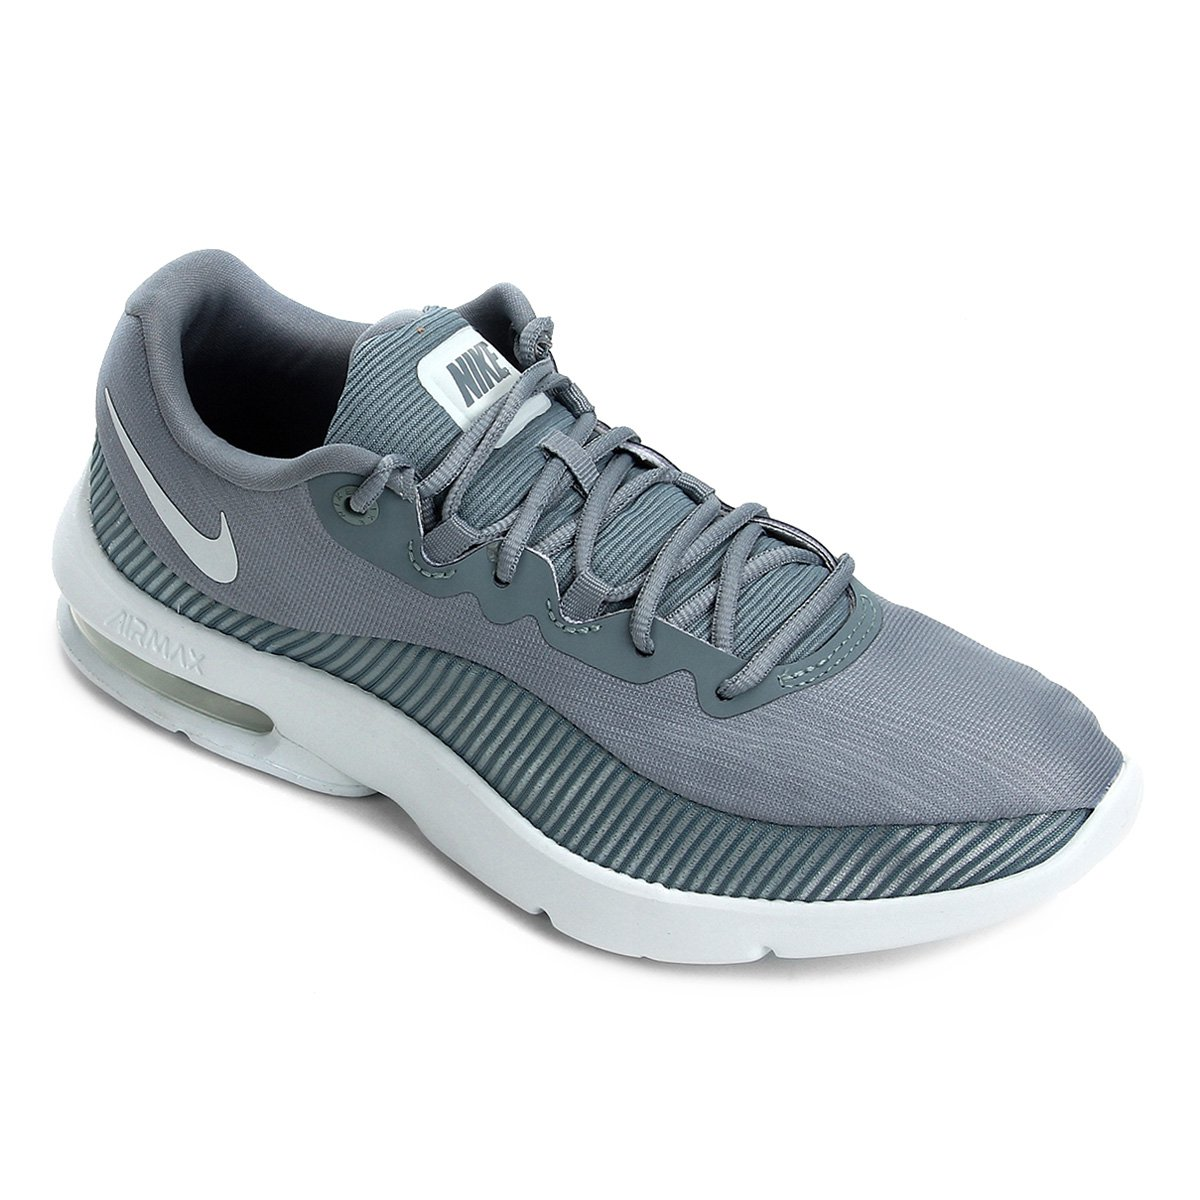 Tênis Nike Air Max Advantage 2 Feminino Azul Petróleo E Cinza